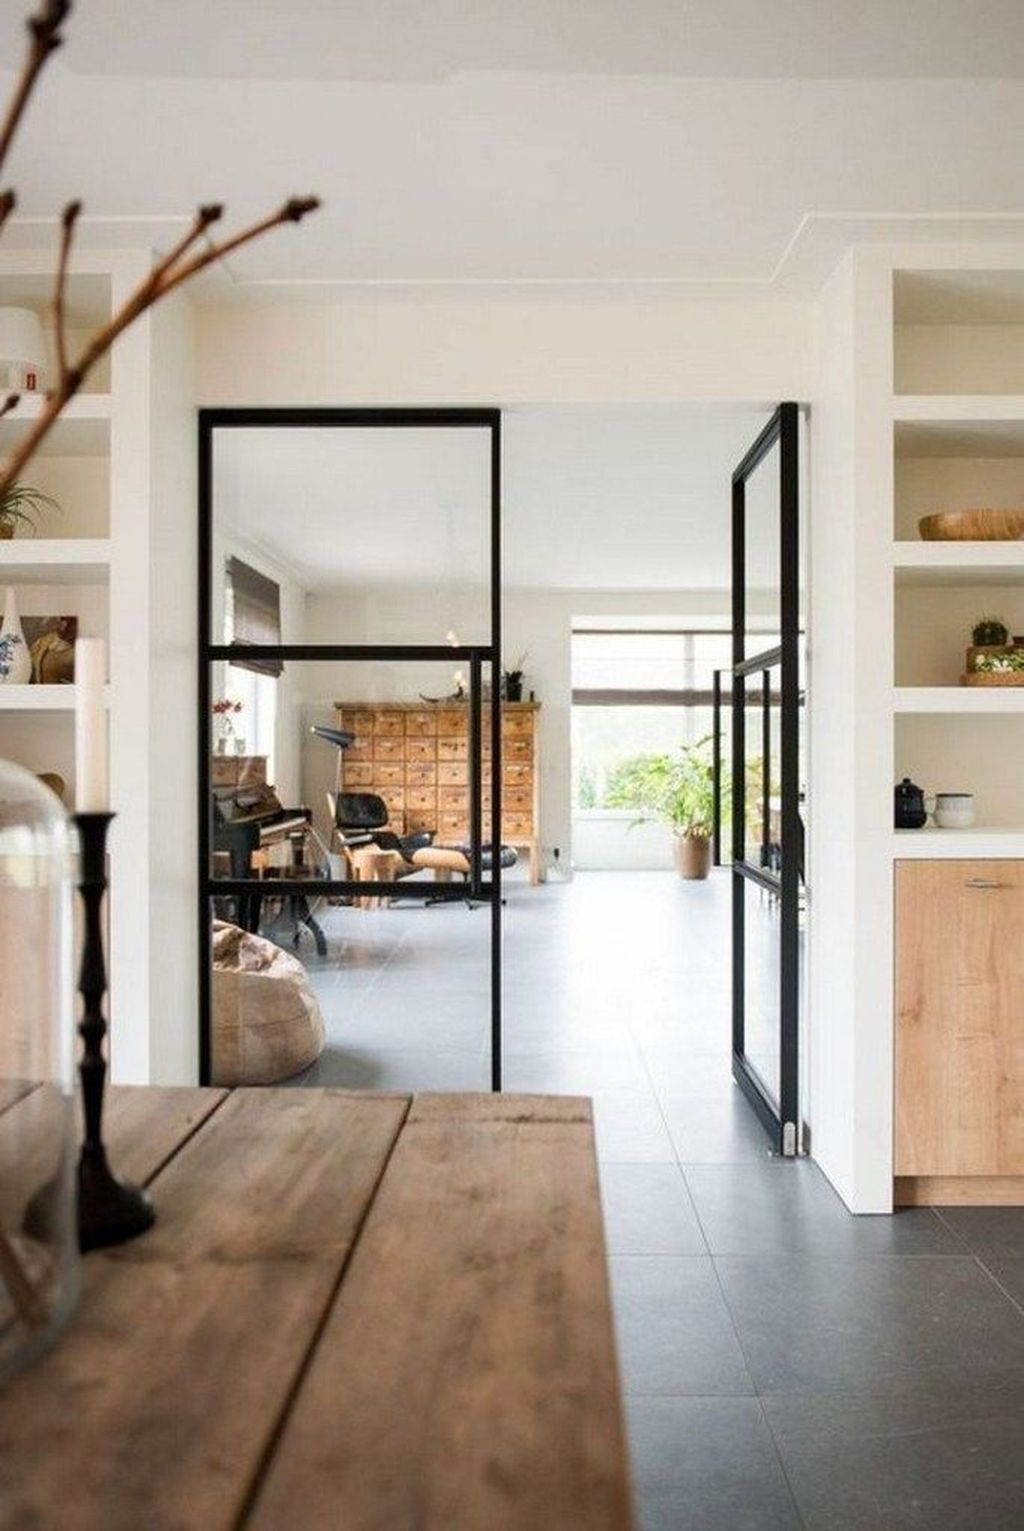 Minimalist Home Door Design You Have Must See32 Home Door Design Scandinavian Interior Design Doors Interior